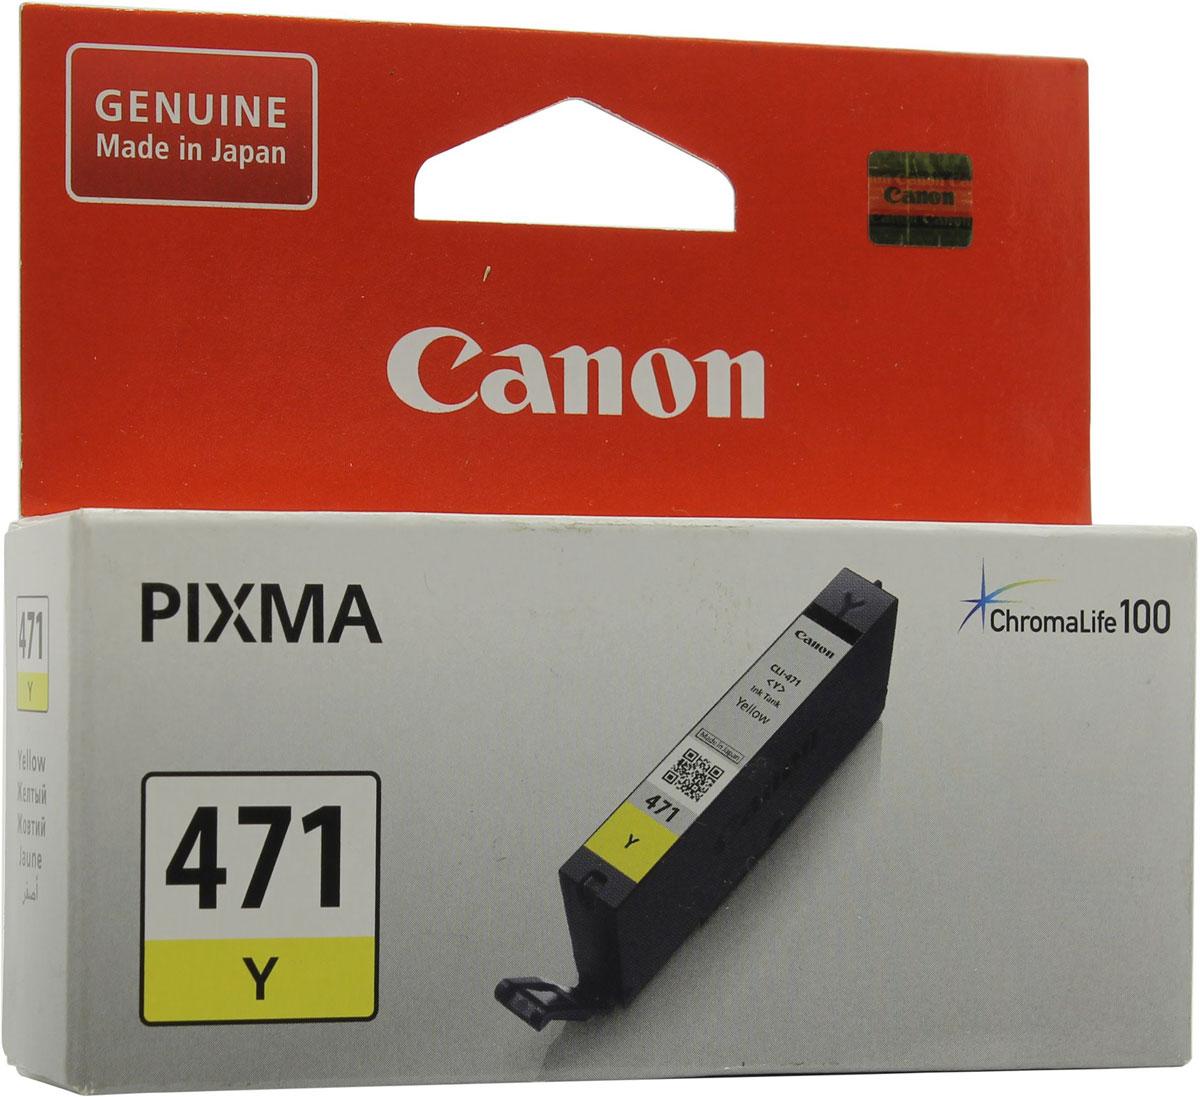 Canon CLI-471, Yellow картридж для Pixma MG5740/6840/7740 canon pixma mg5740